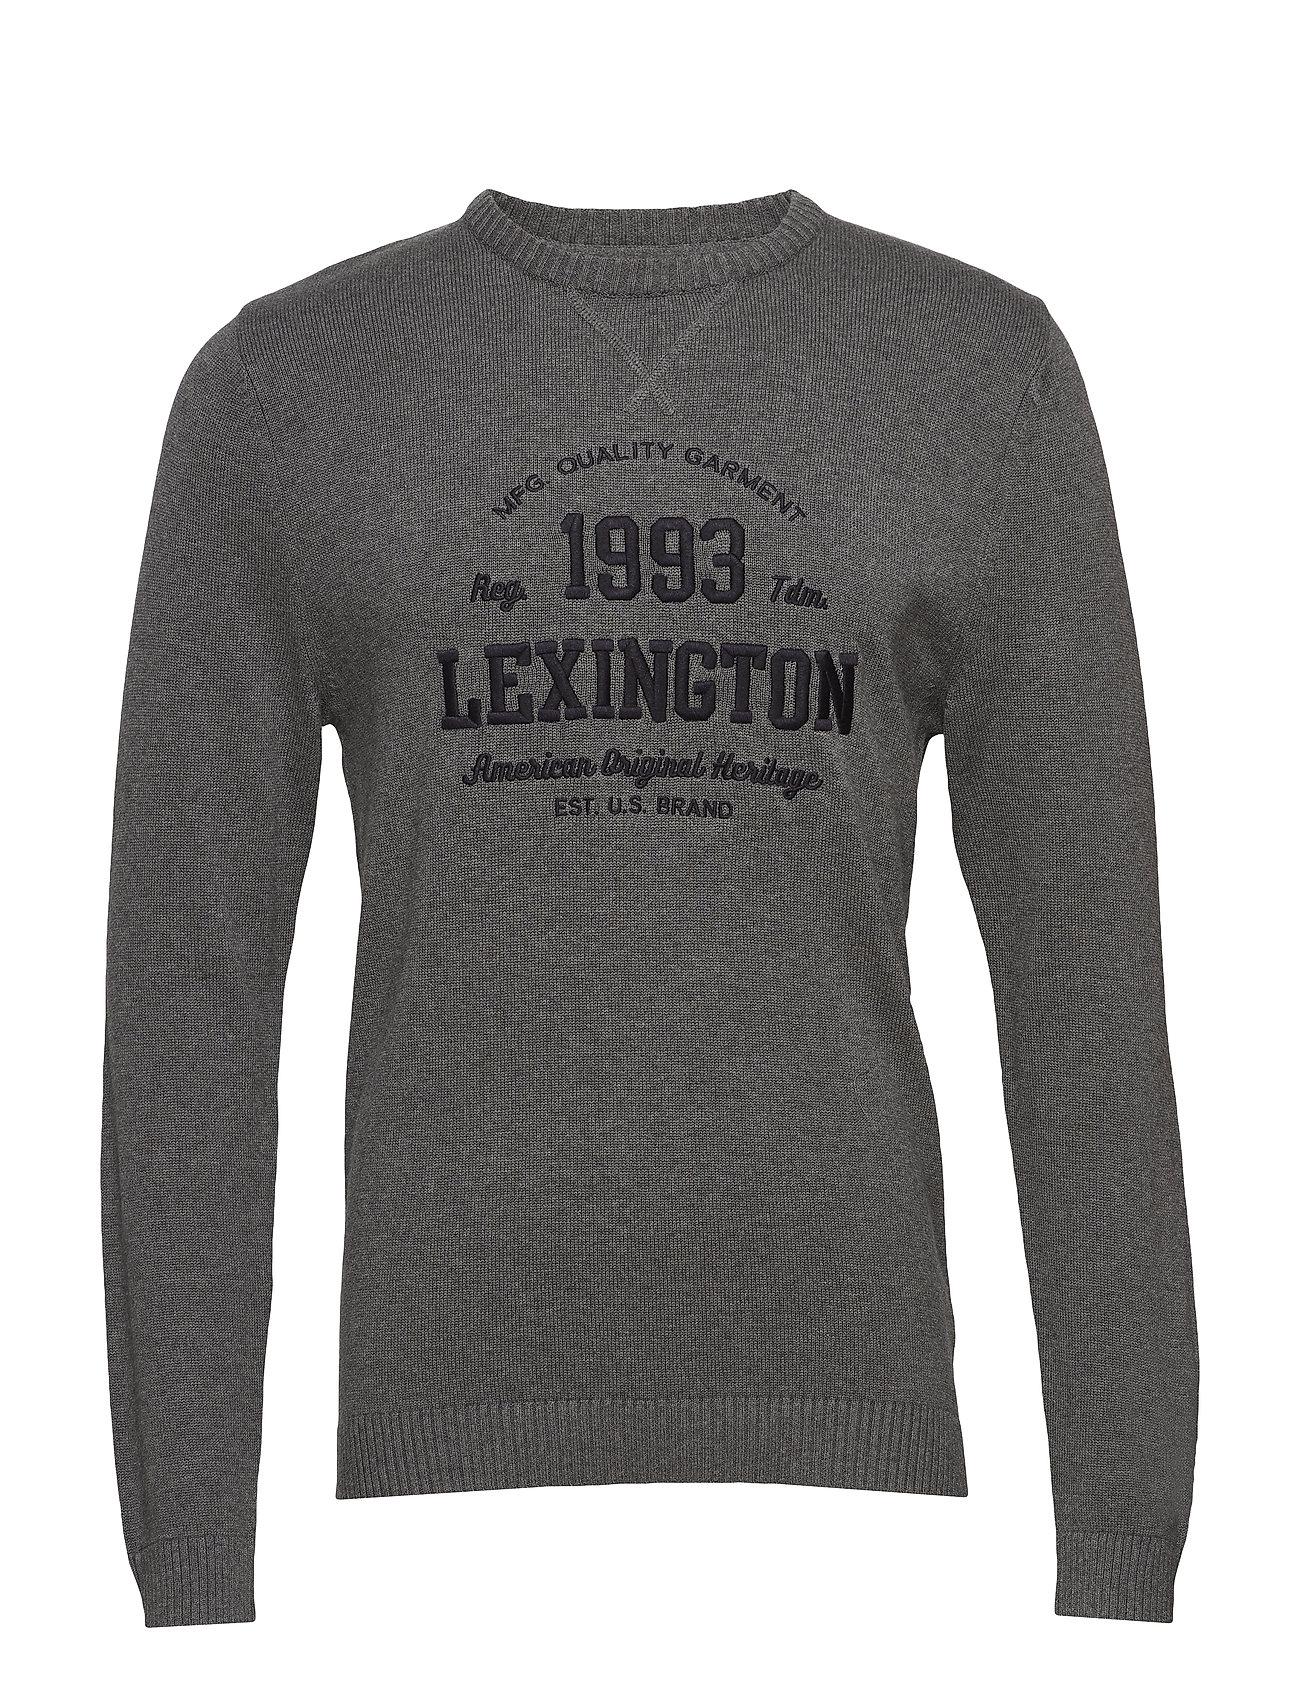 Lexington Clothing Nelson Knitted Sweatshirt